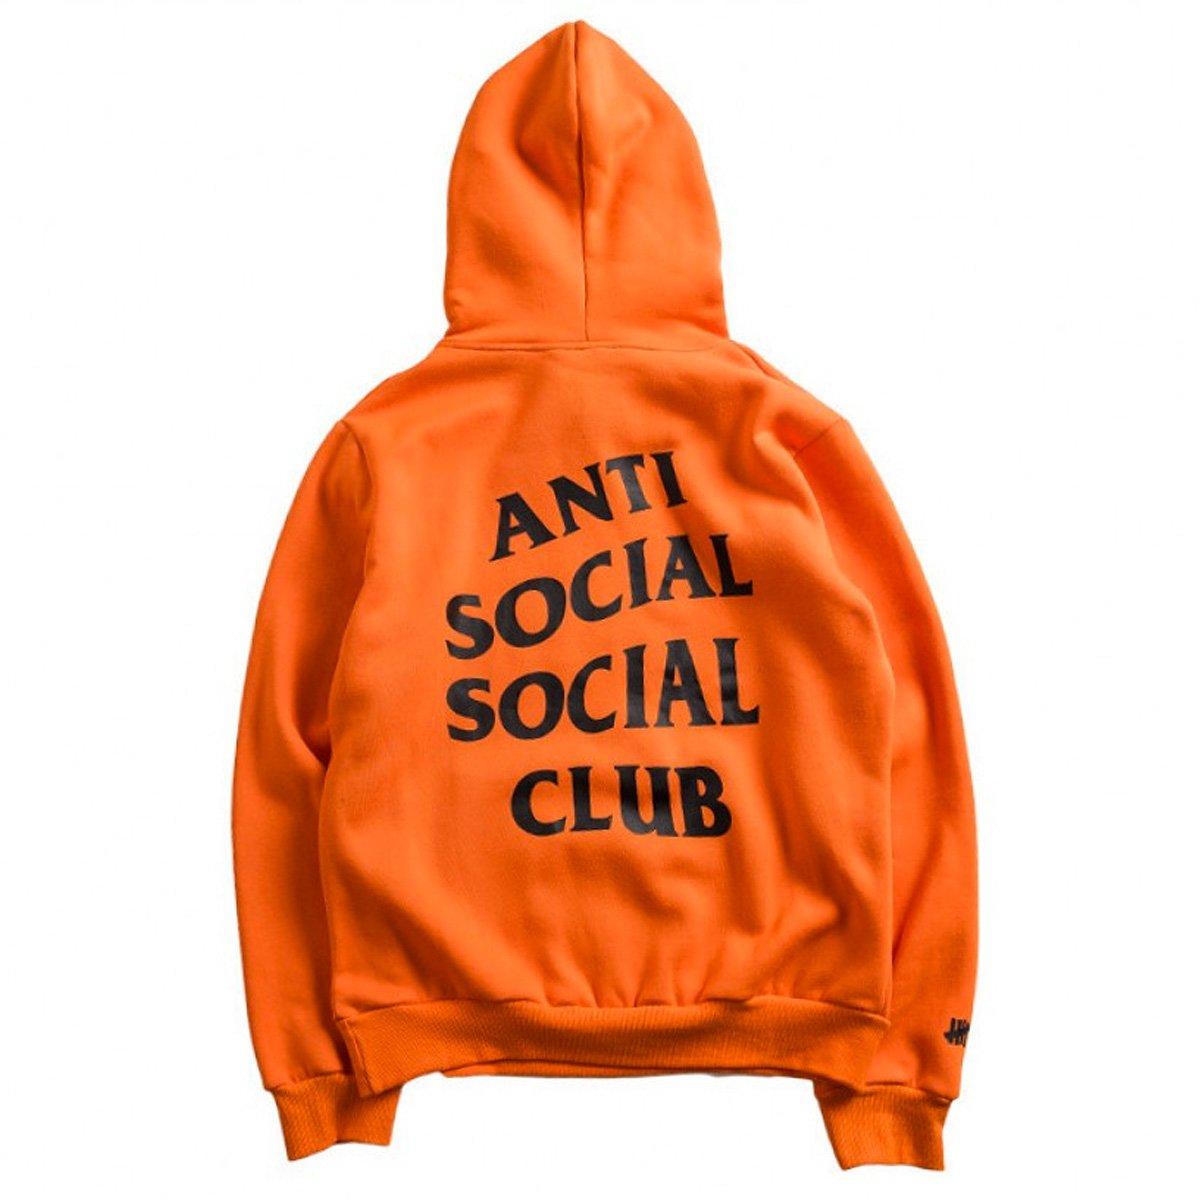 Anti Social Social Club パーカー アンチソーシャルソーシャルクラブ Undefeated PARANOID HOODIE PARANOID-H-0 B07D1LLPRC L|オレンジ オレンジ L